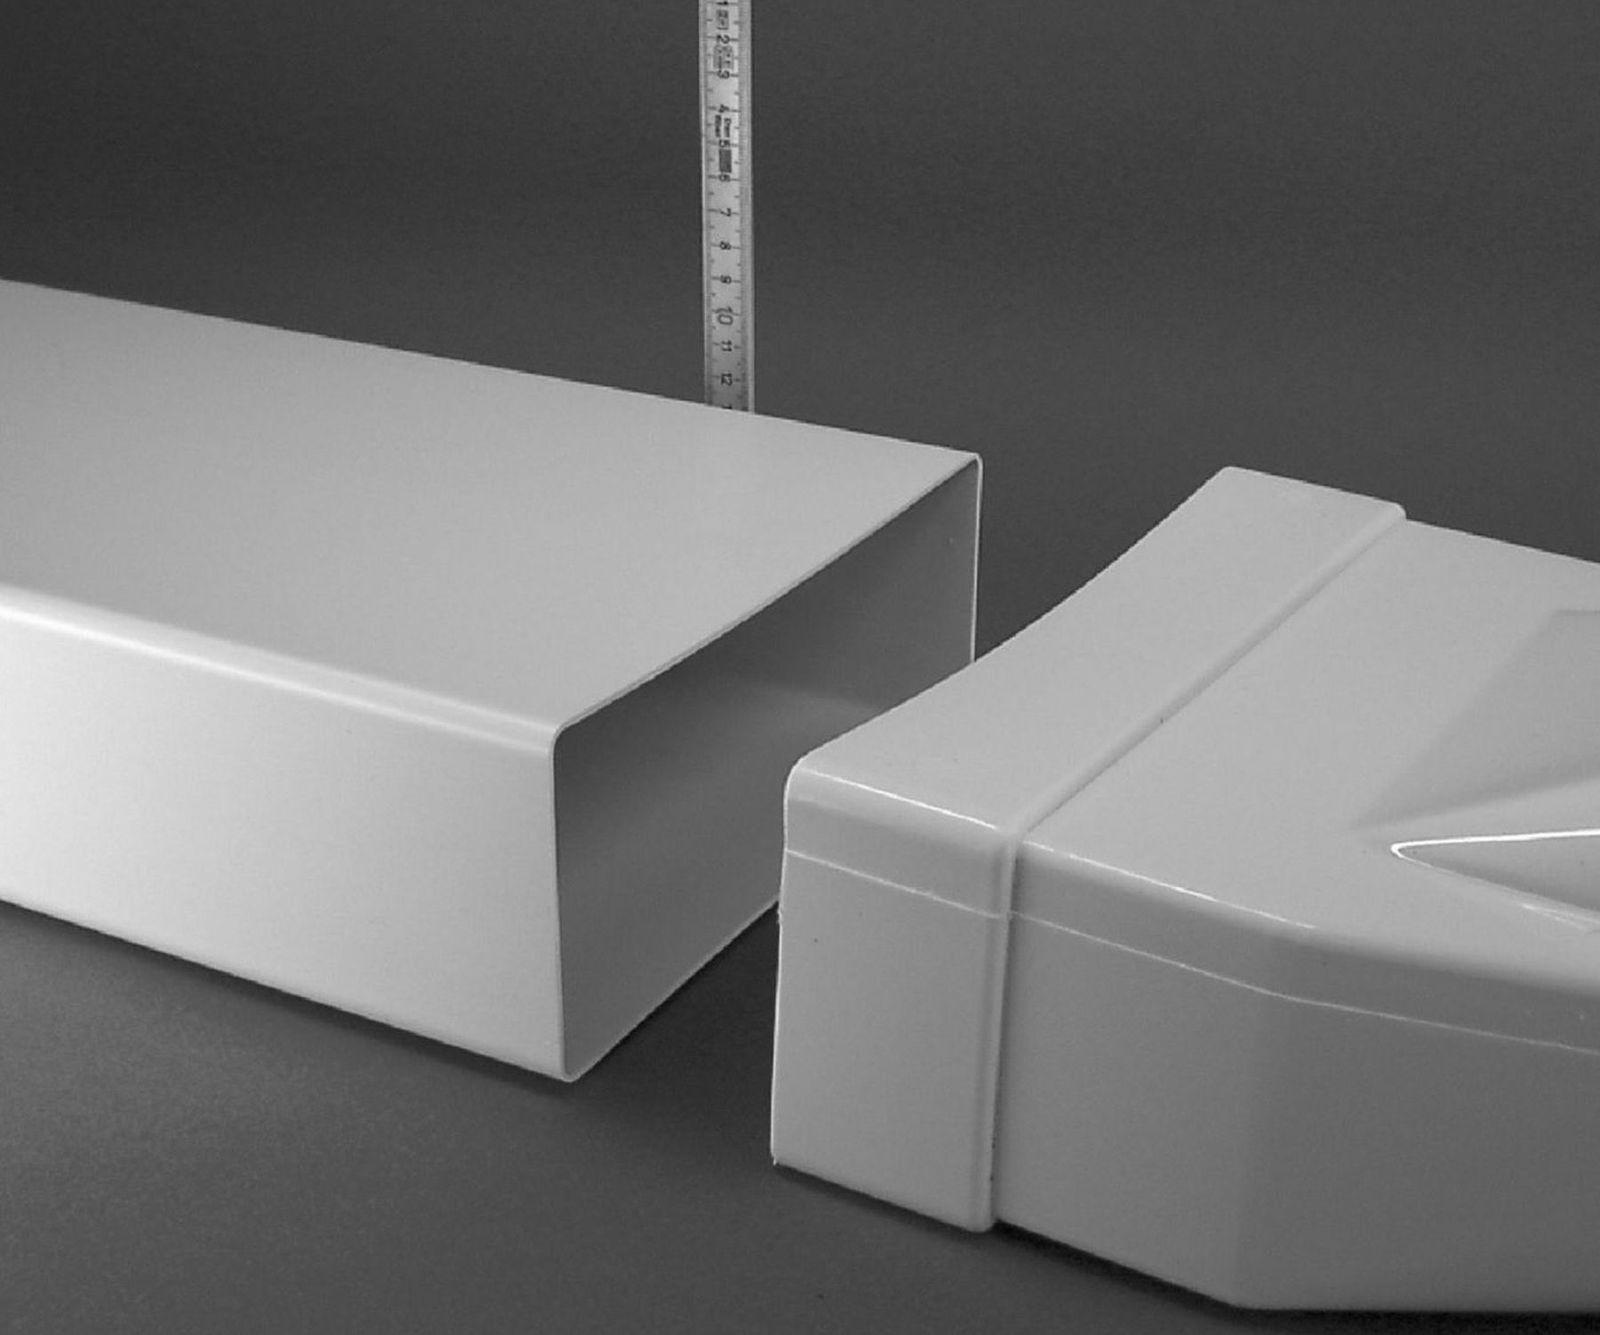 kche dunstabzug with kche dunstabzug perfect homgeek cfm. Black Bedroom Furniture Sets. Home Design Ideas